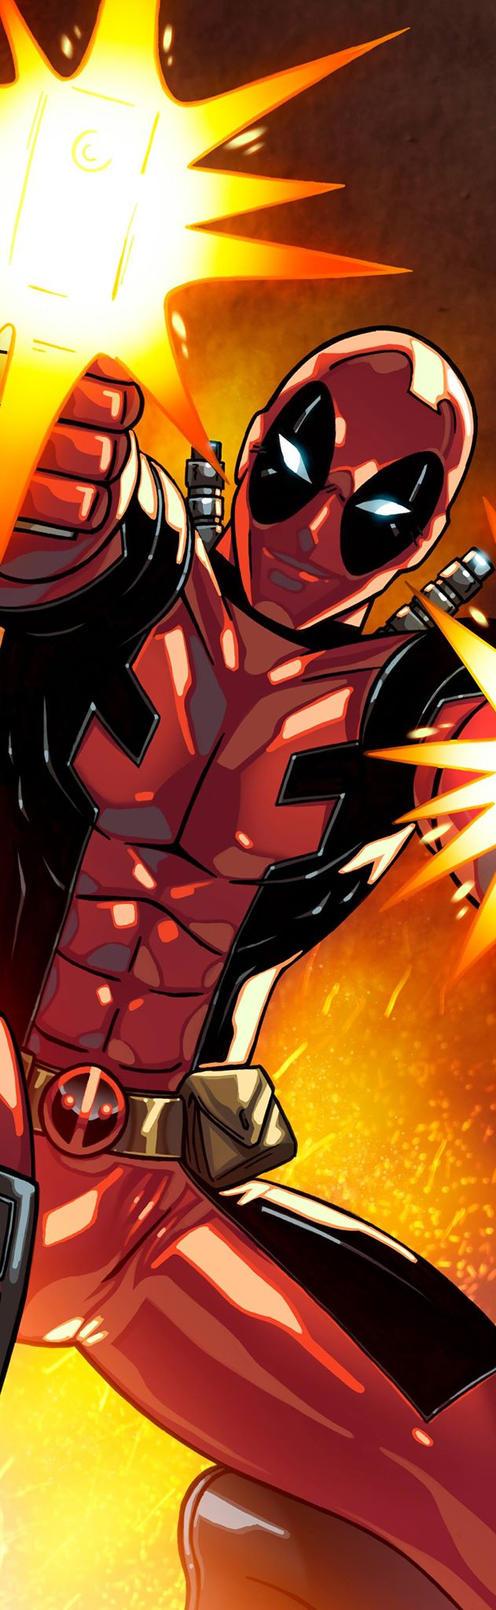 Deadpool Panel Art by RichBernatovech